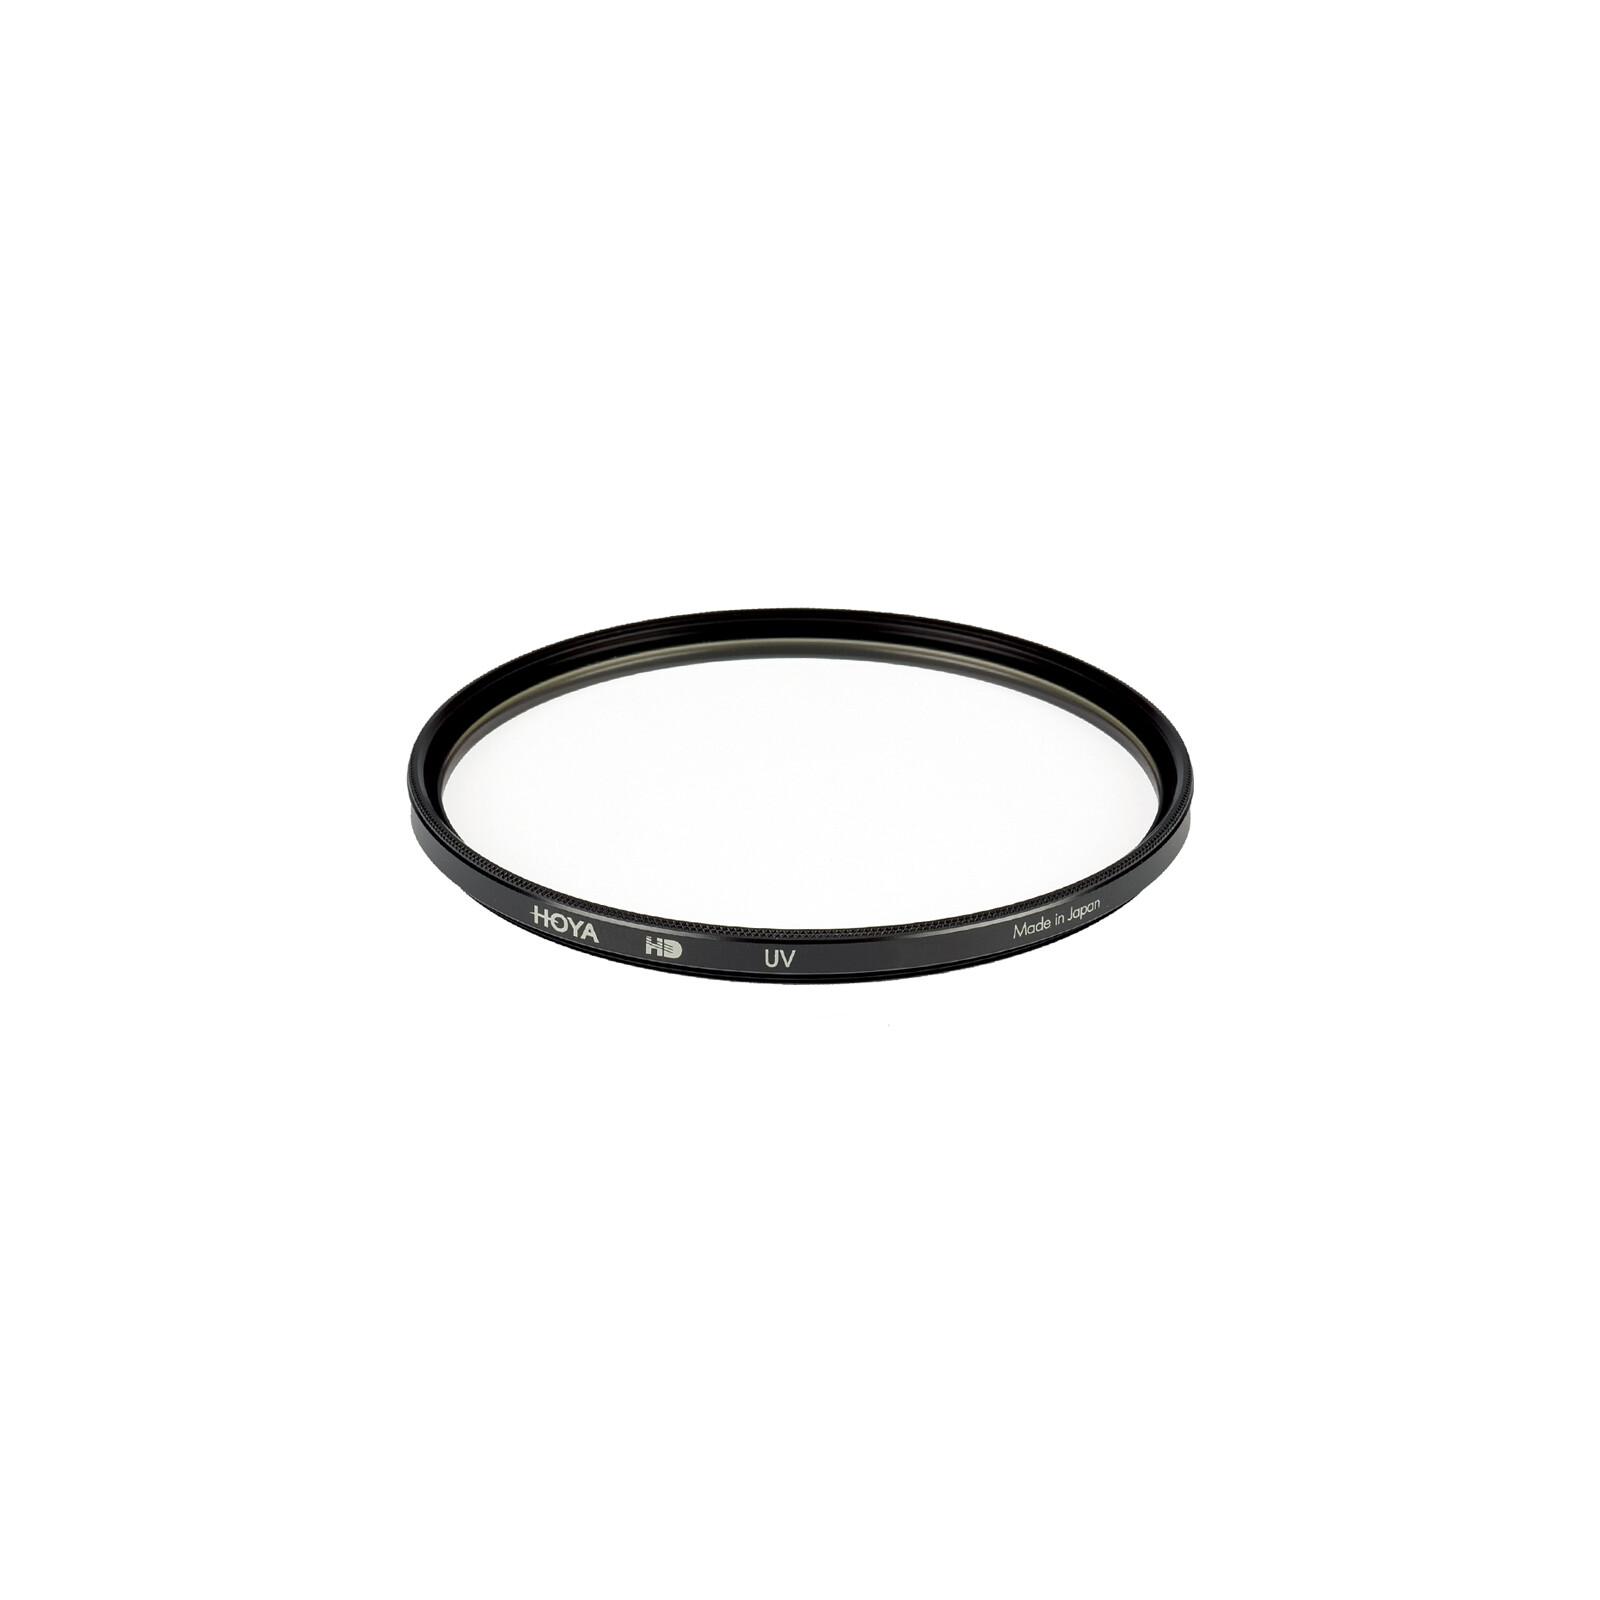 Hoya UV HD 58mm Slim